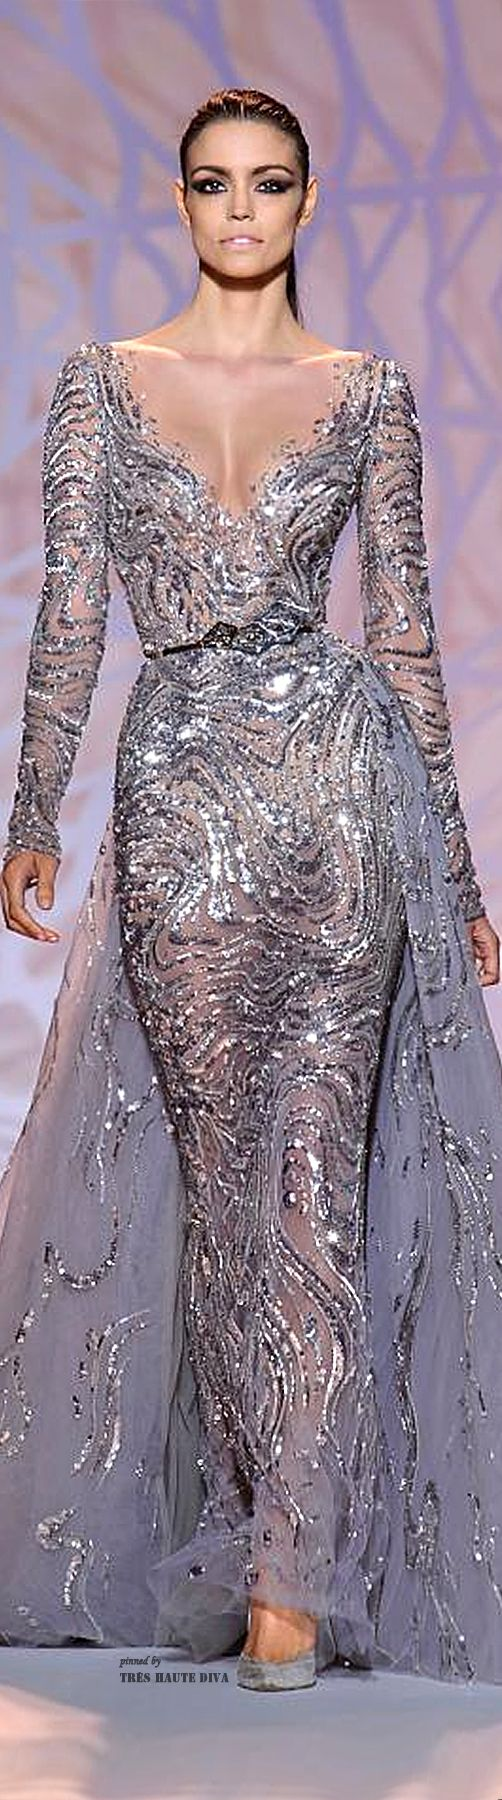 Zuhair Murad Haute Couture Fall/Winter 2014-15. V